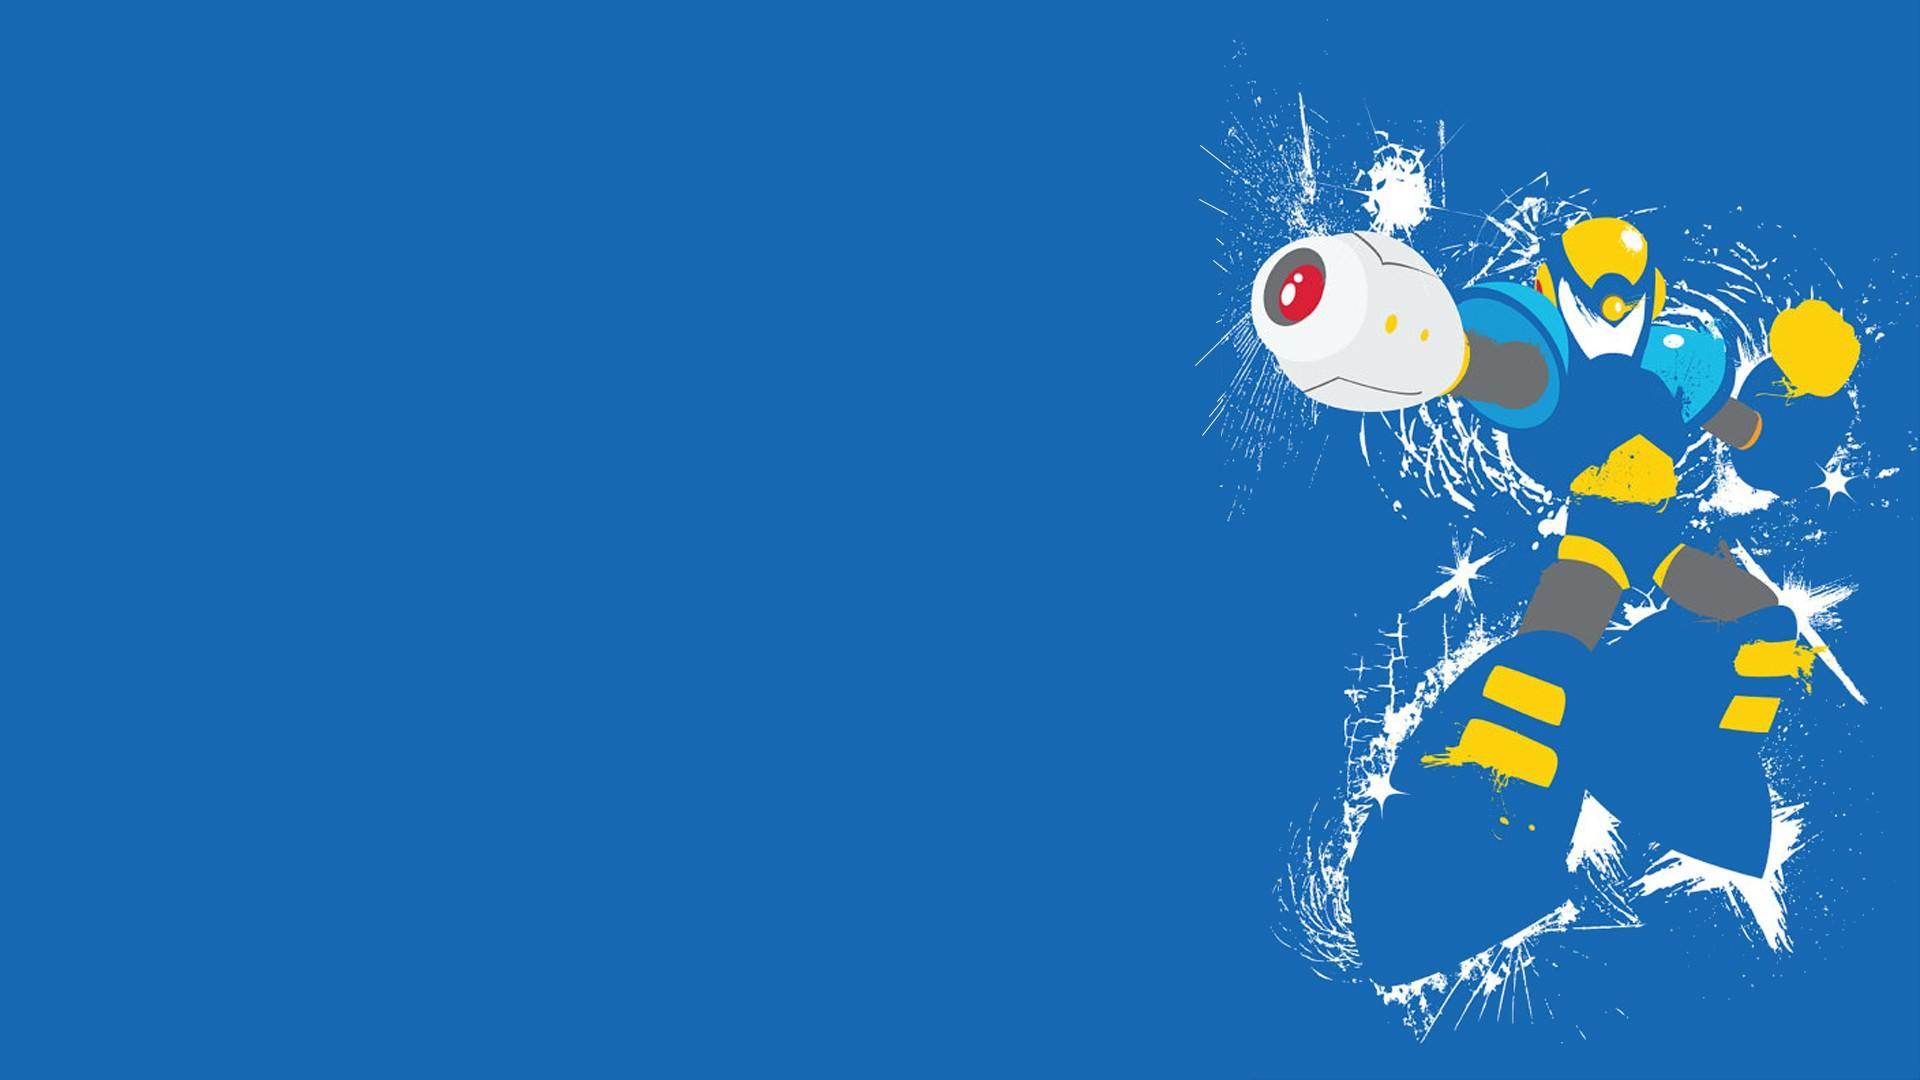 Mega Man Iphone Wallpaper Mega Man Full Hd Wallpaper And Background 1920x1080 Id